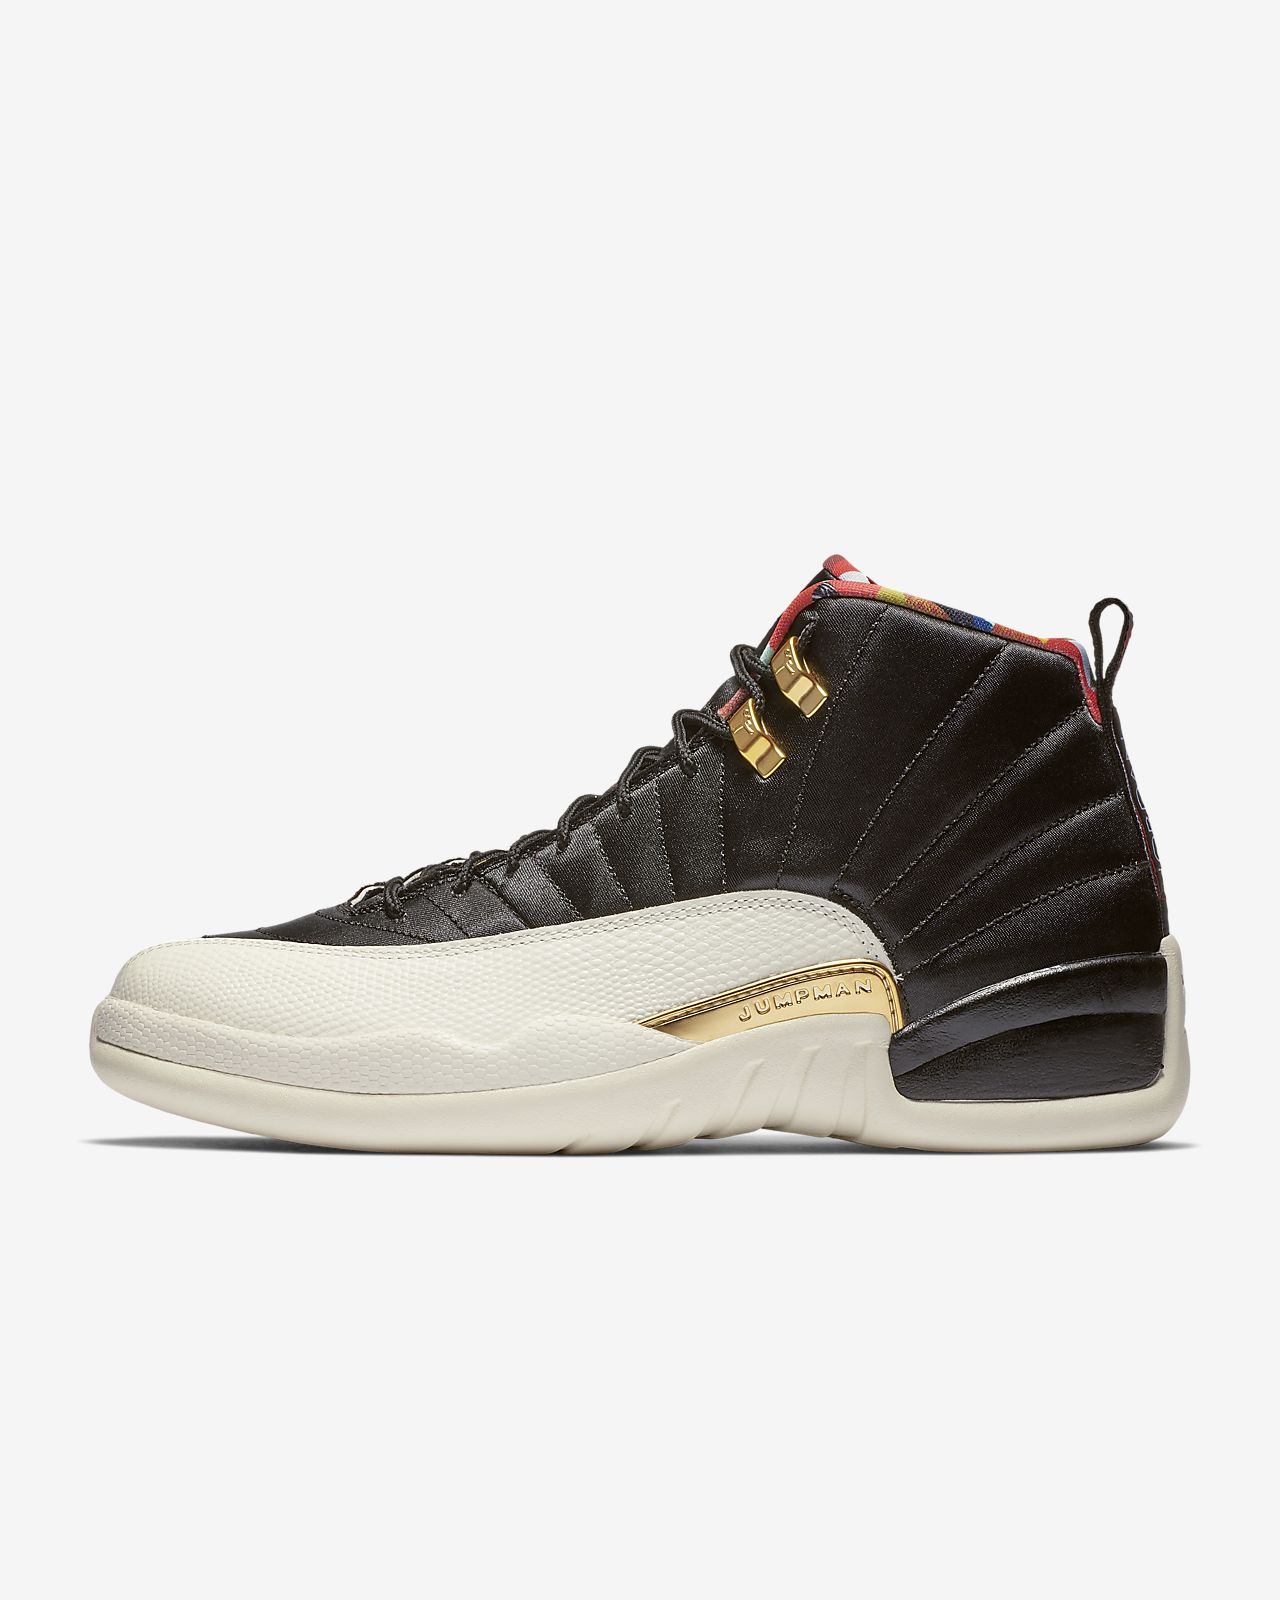 separation shoes ebe3a 0d5cb low cost nike air jordan 12 retro playoff schwarz weiss 497dc 820a4   inexpensive air jordan 12 retro cny herrenschuh 534f5 74b37